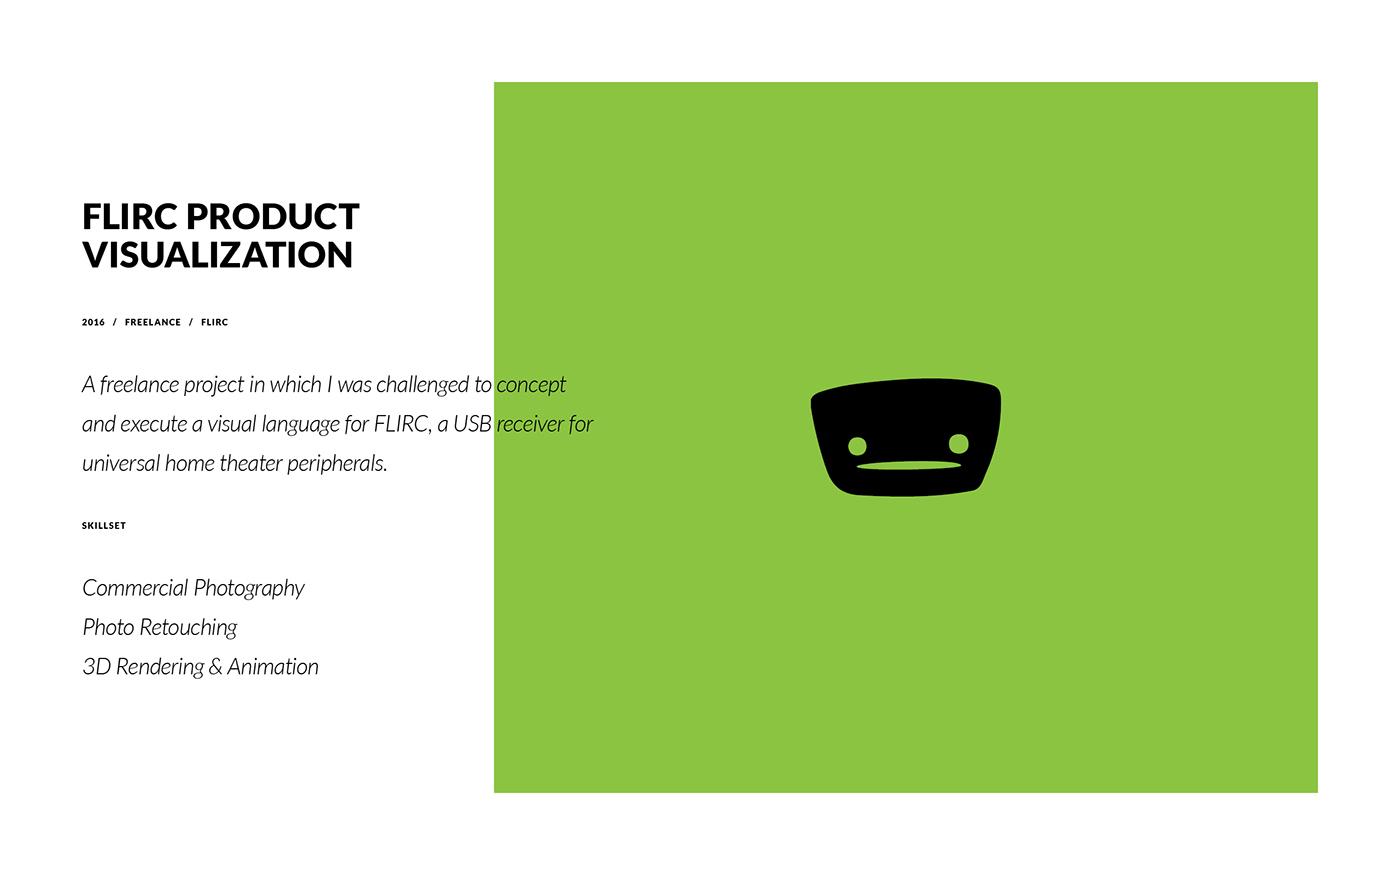 FLIRC usb cinema4d c4d Render animation  remote universal product